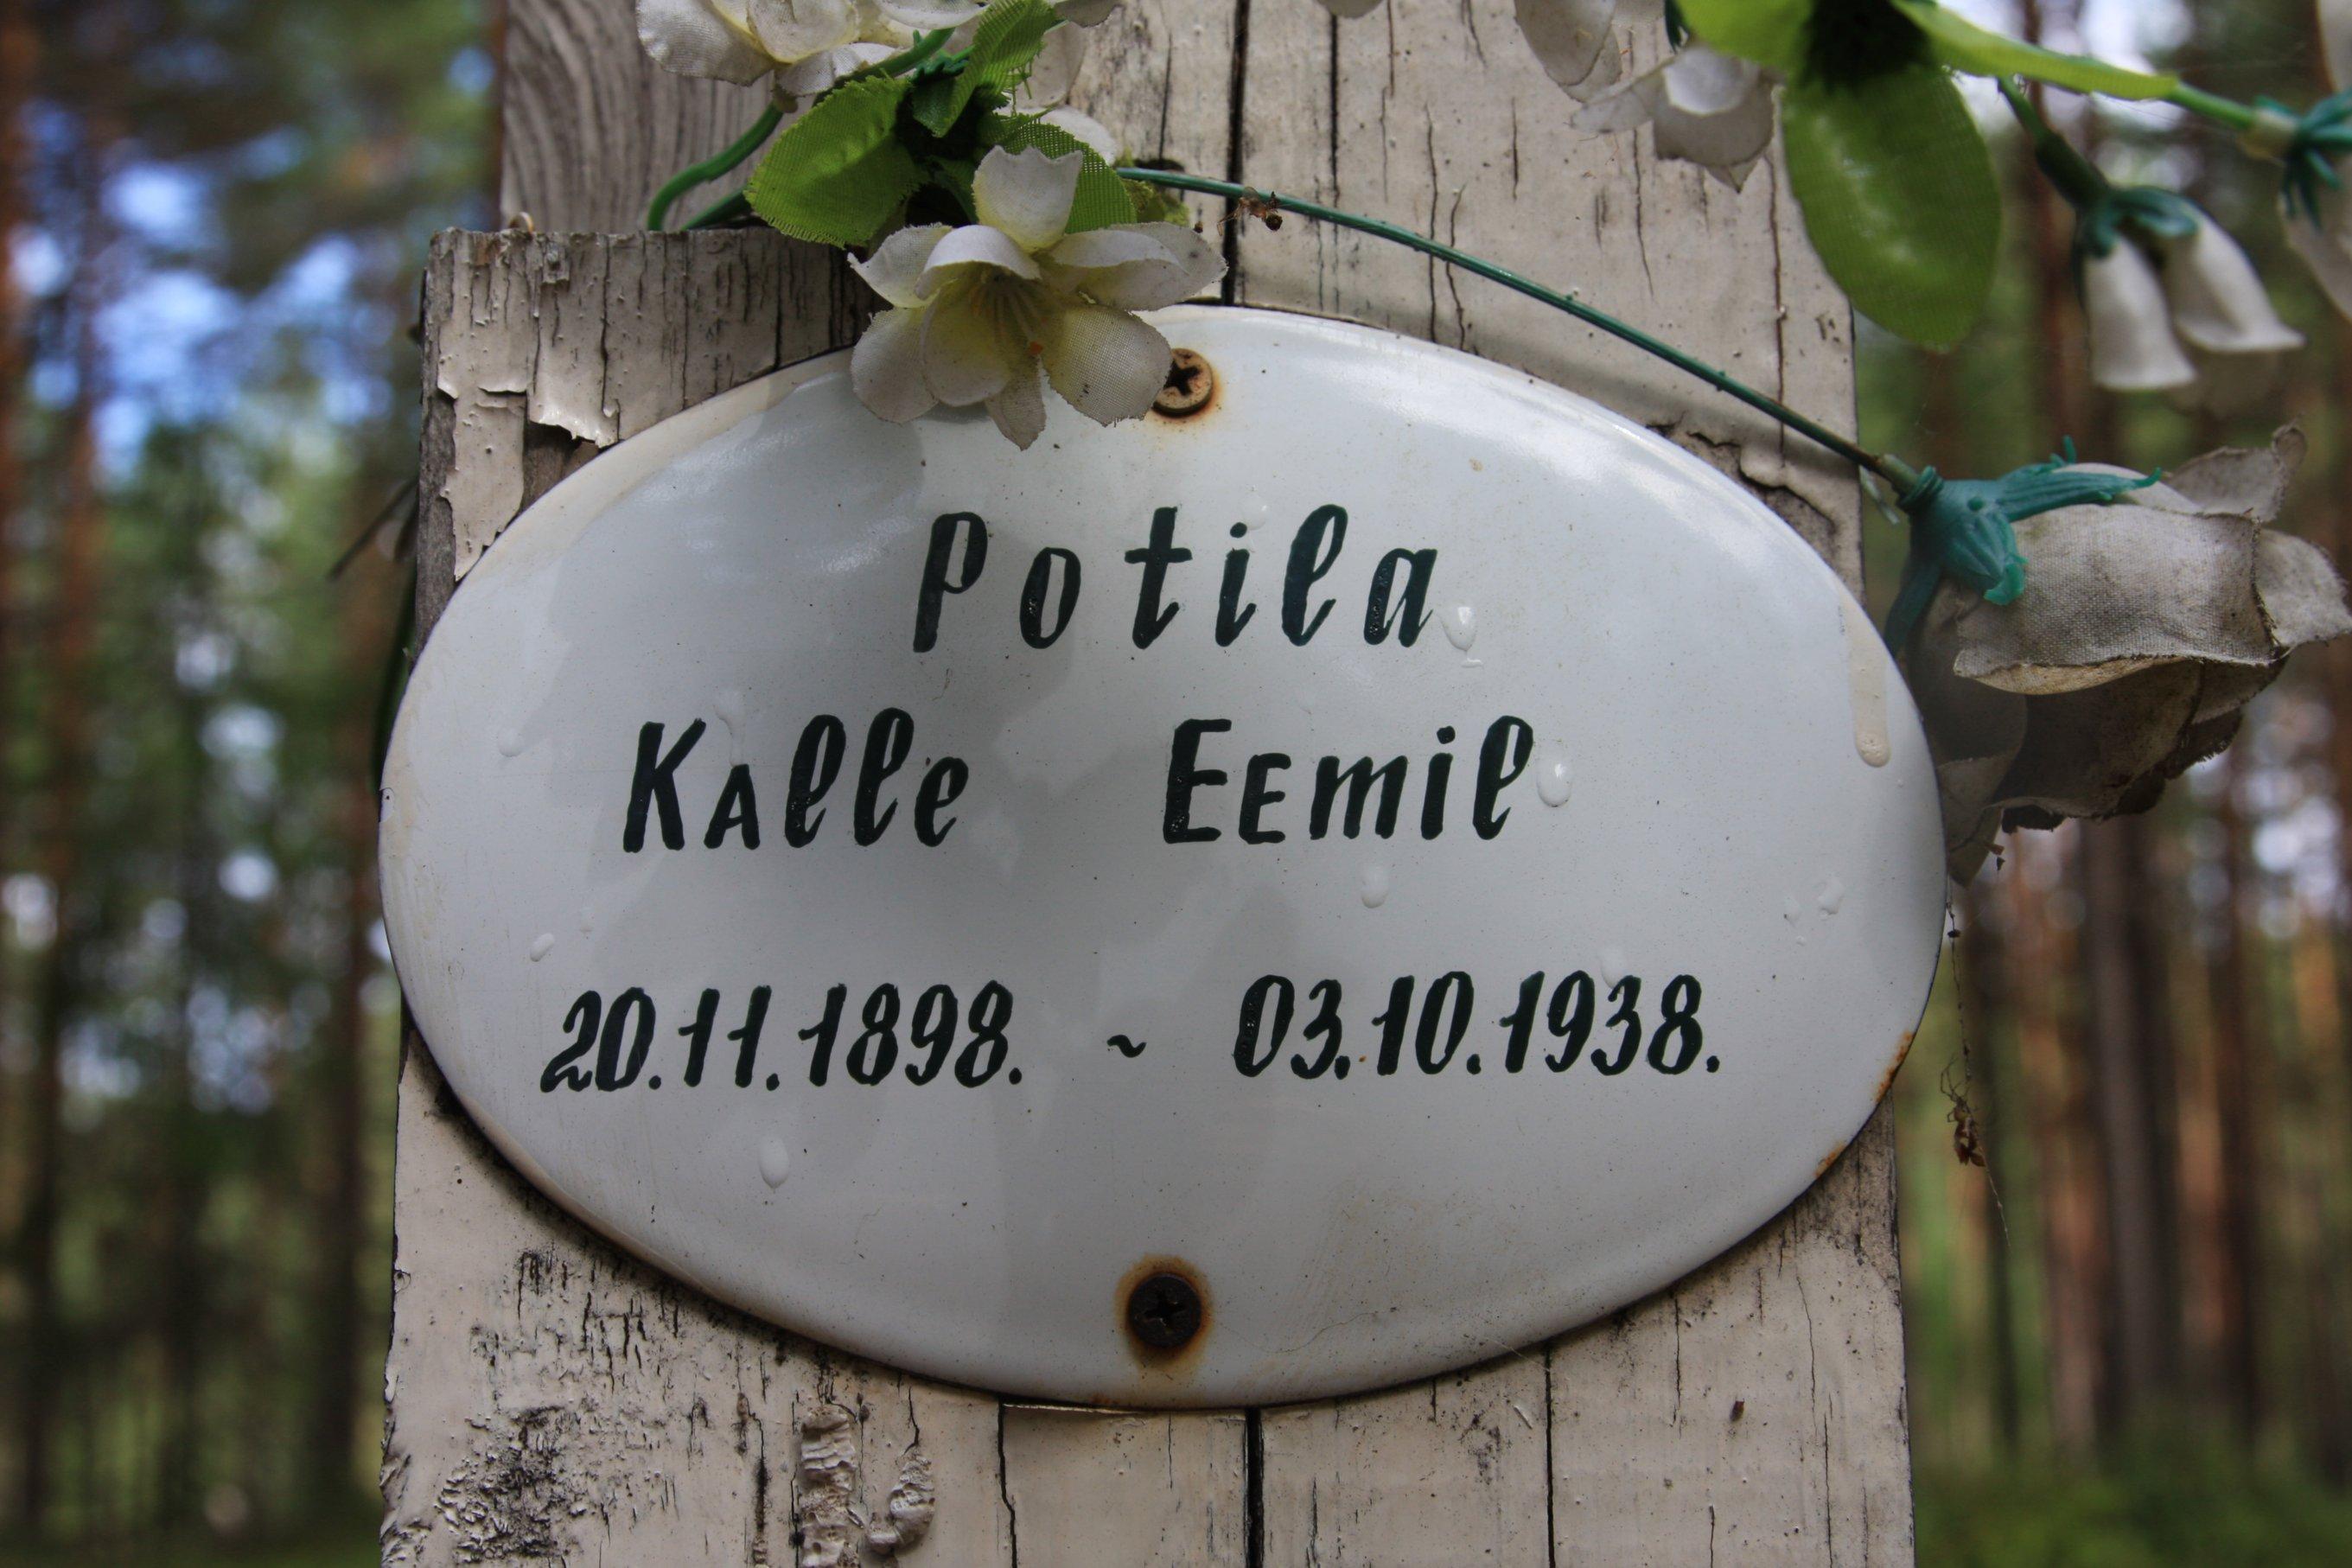 Памятная табличка «Potila Kalle Eemil». Фото 04.08.2018.